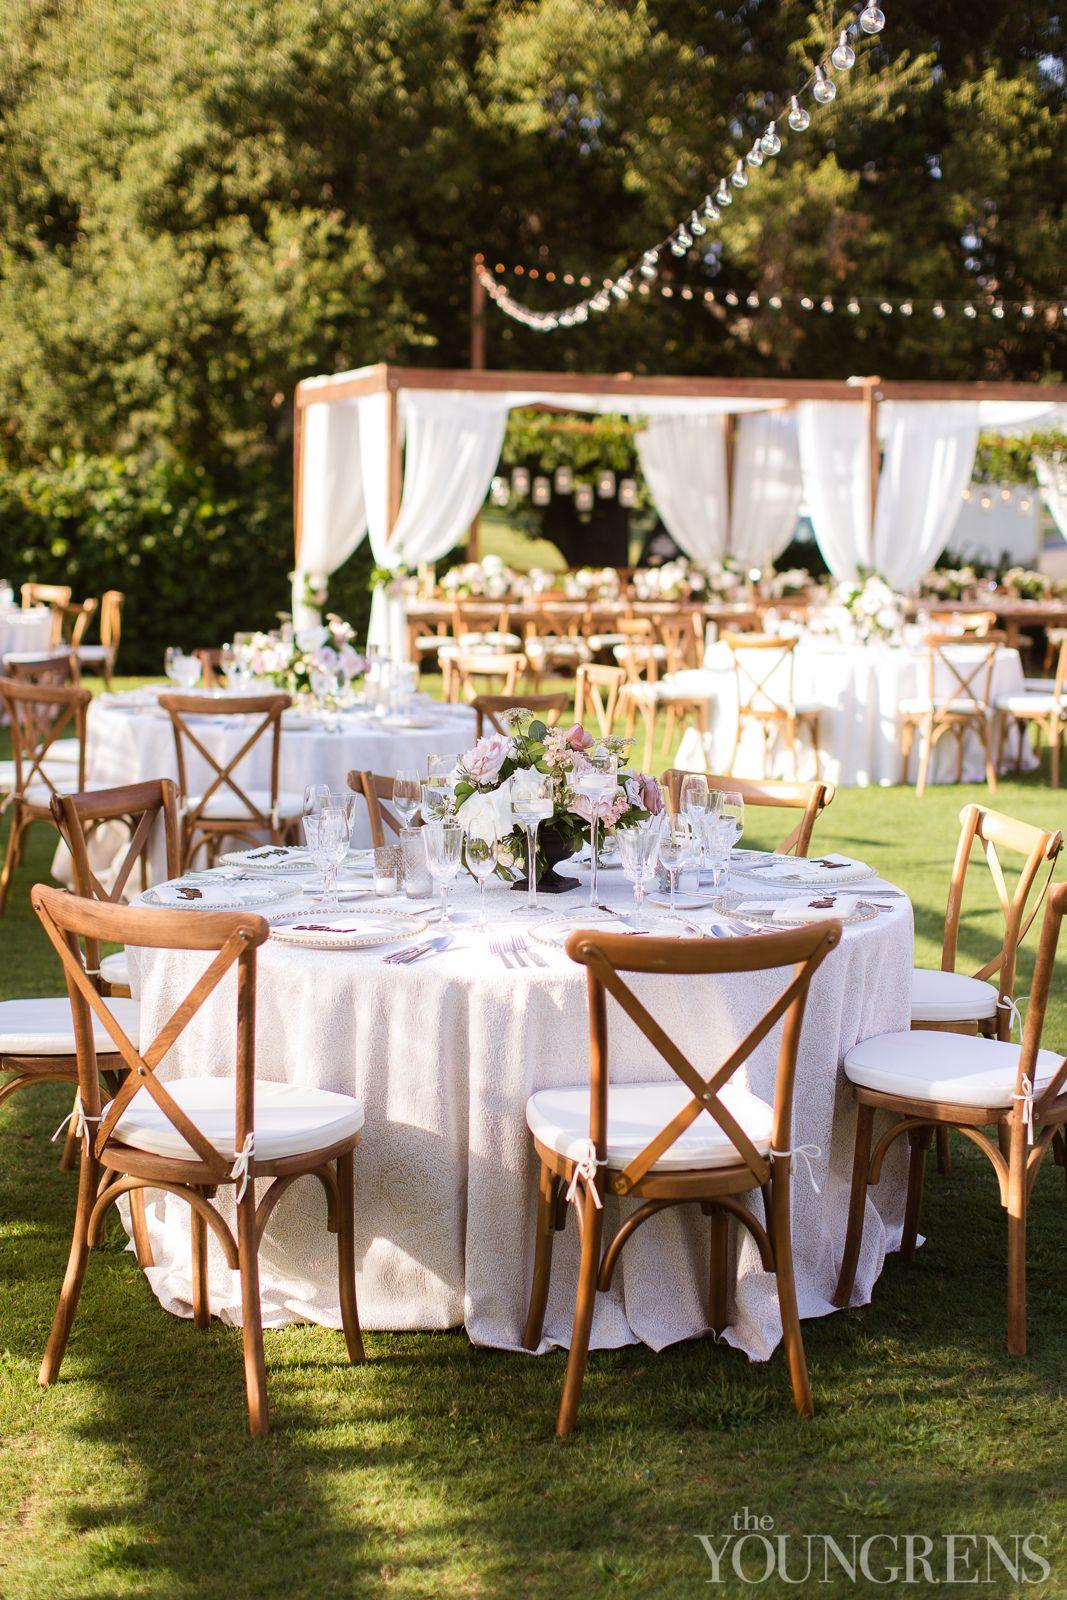 Farm Tables And More San Diego Table Rentals San Diego Wedding Garden Wedding Reception Decorations Garden Wedding Reception Wedding Reception Decorations